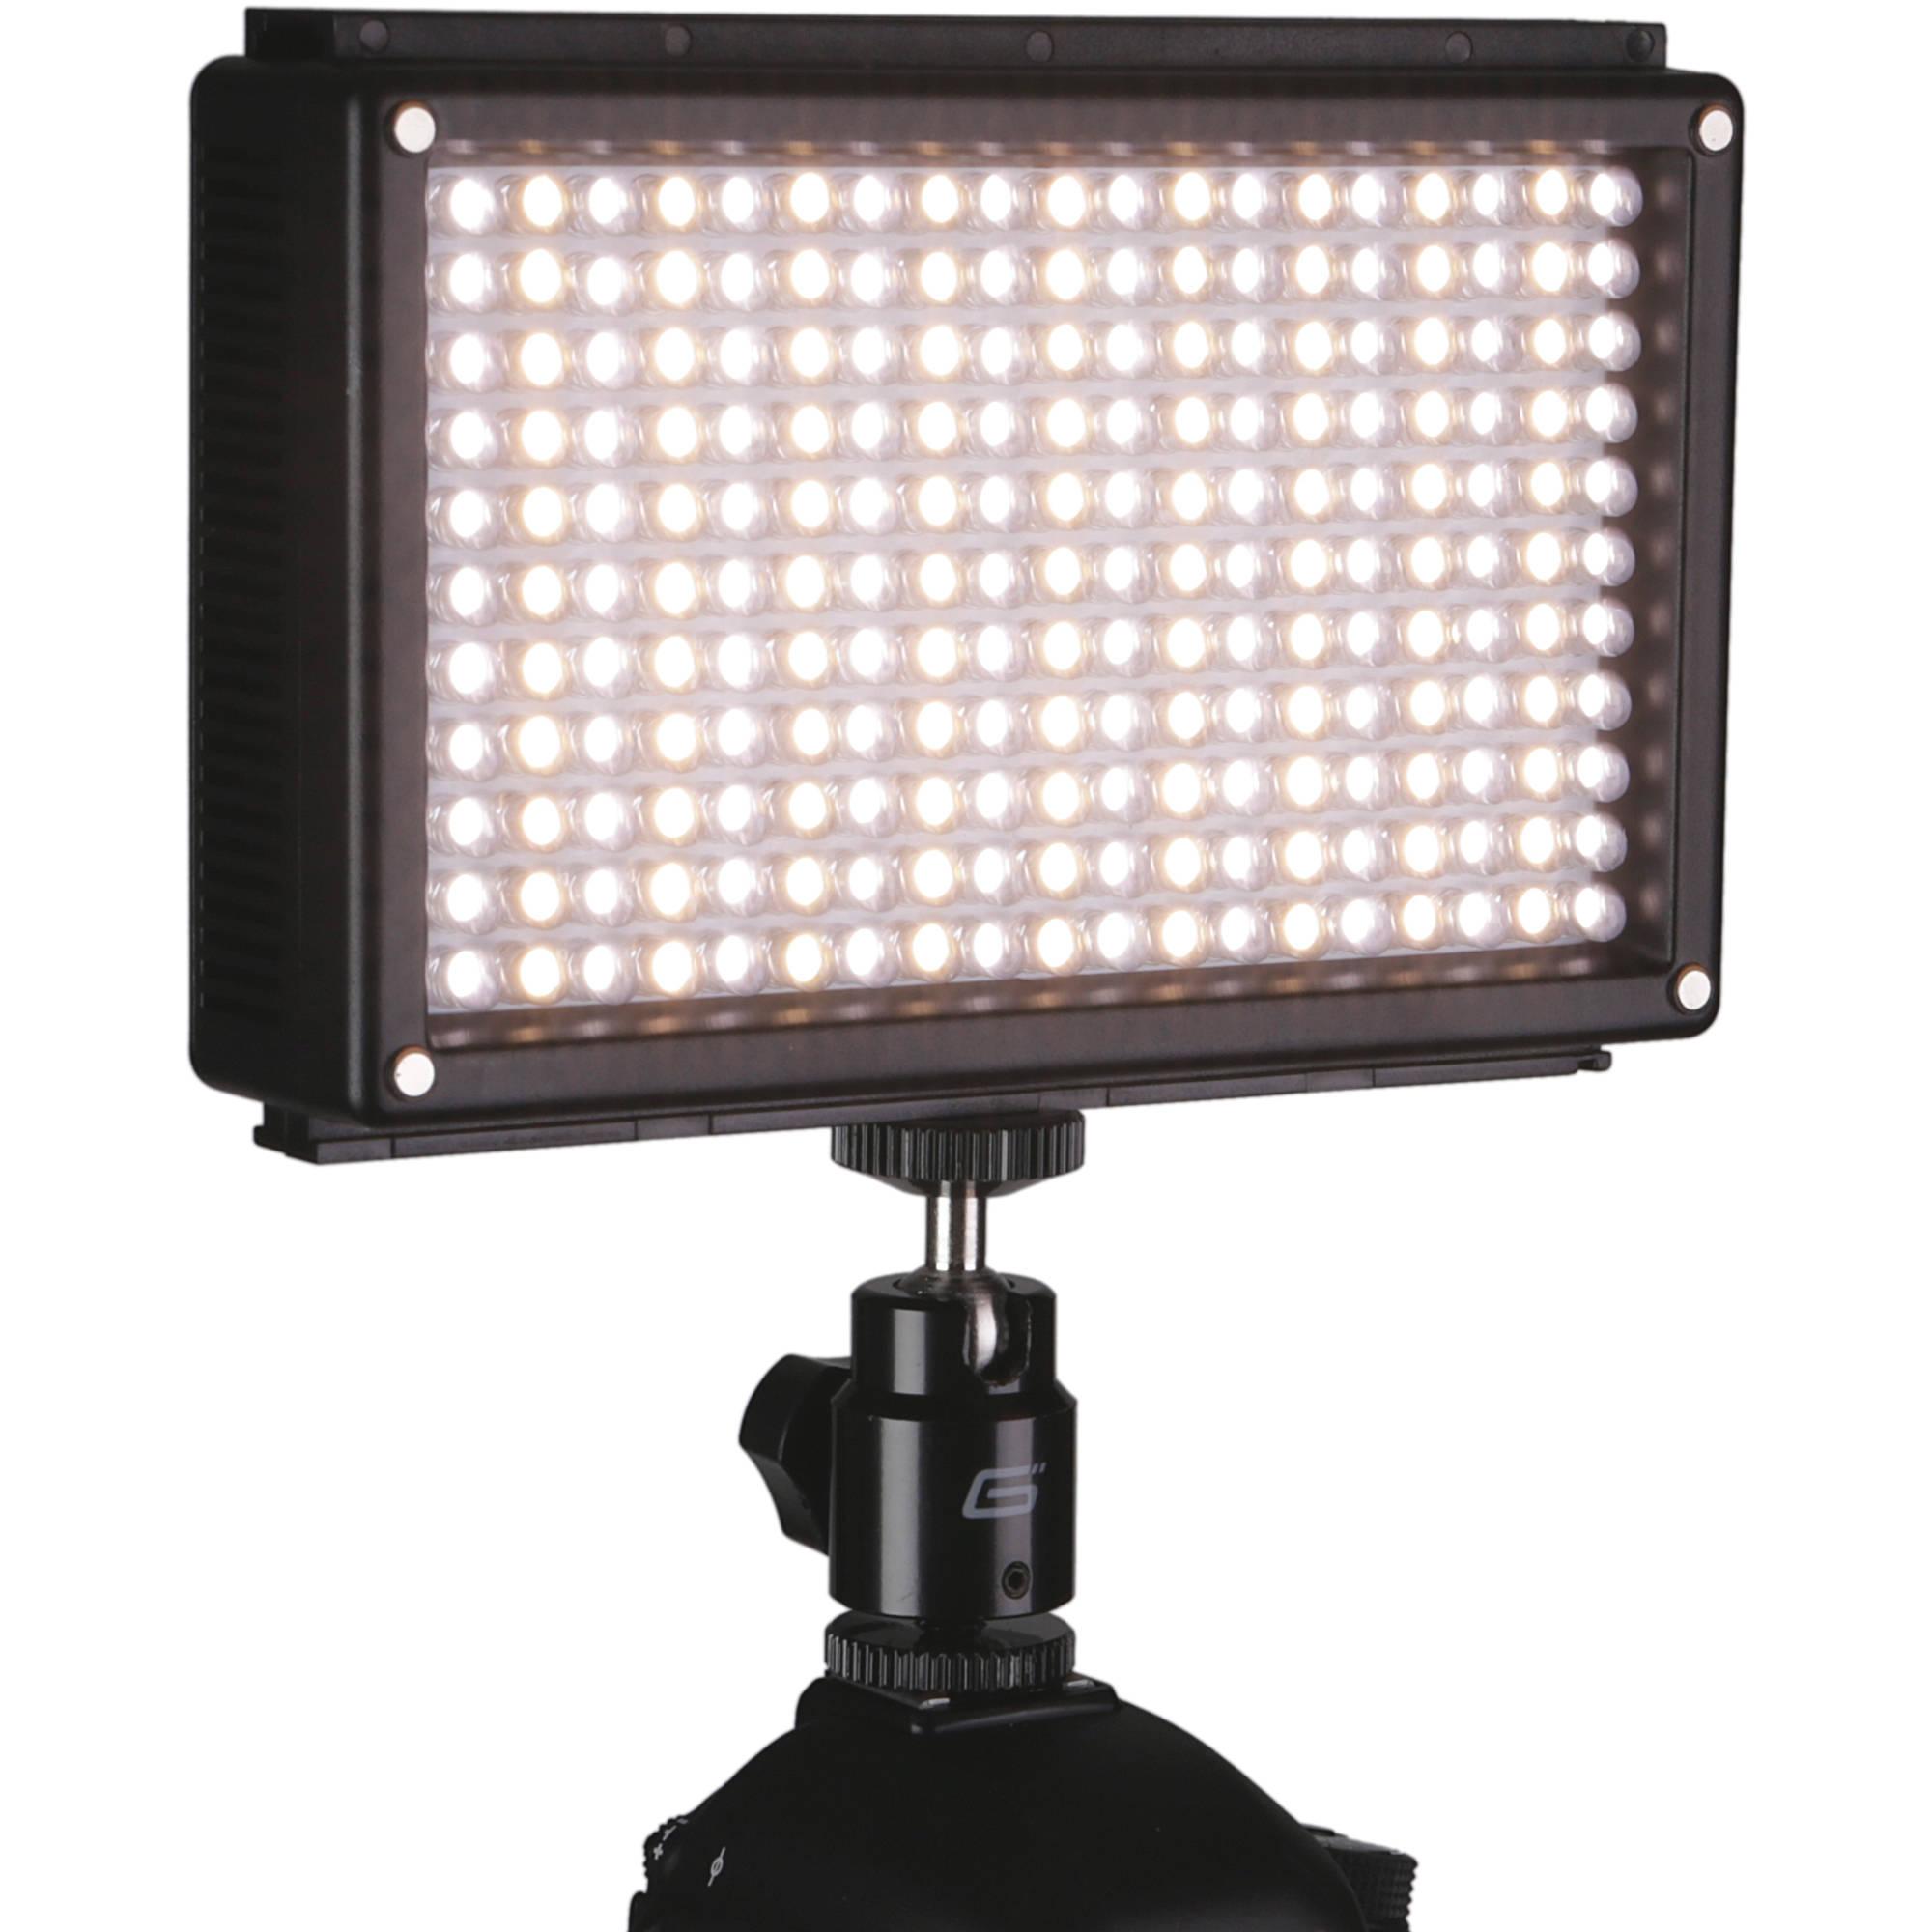 Genaray LED-6500T 209 LED Variable-Color On-Camera LED